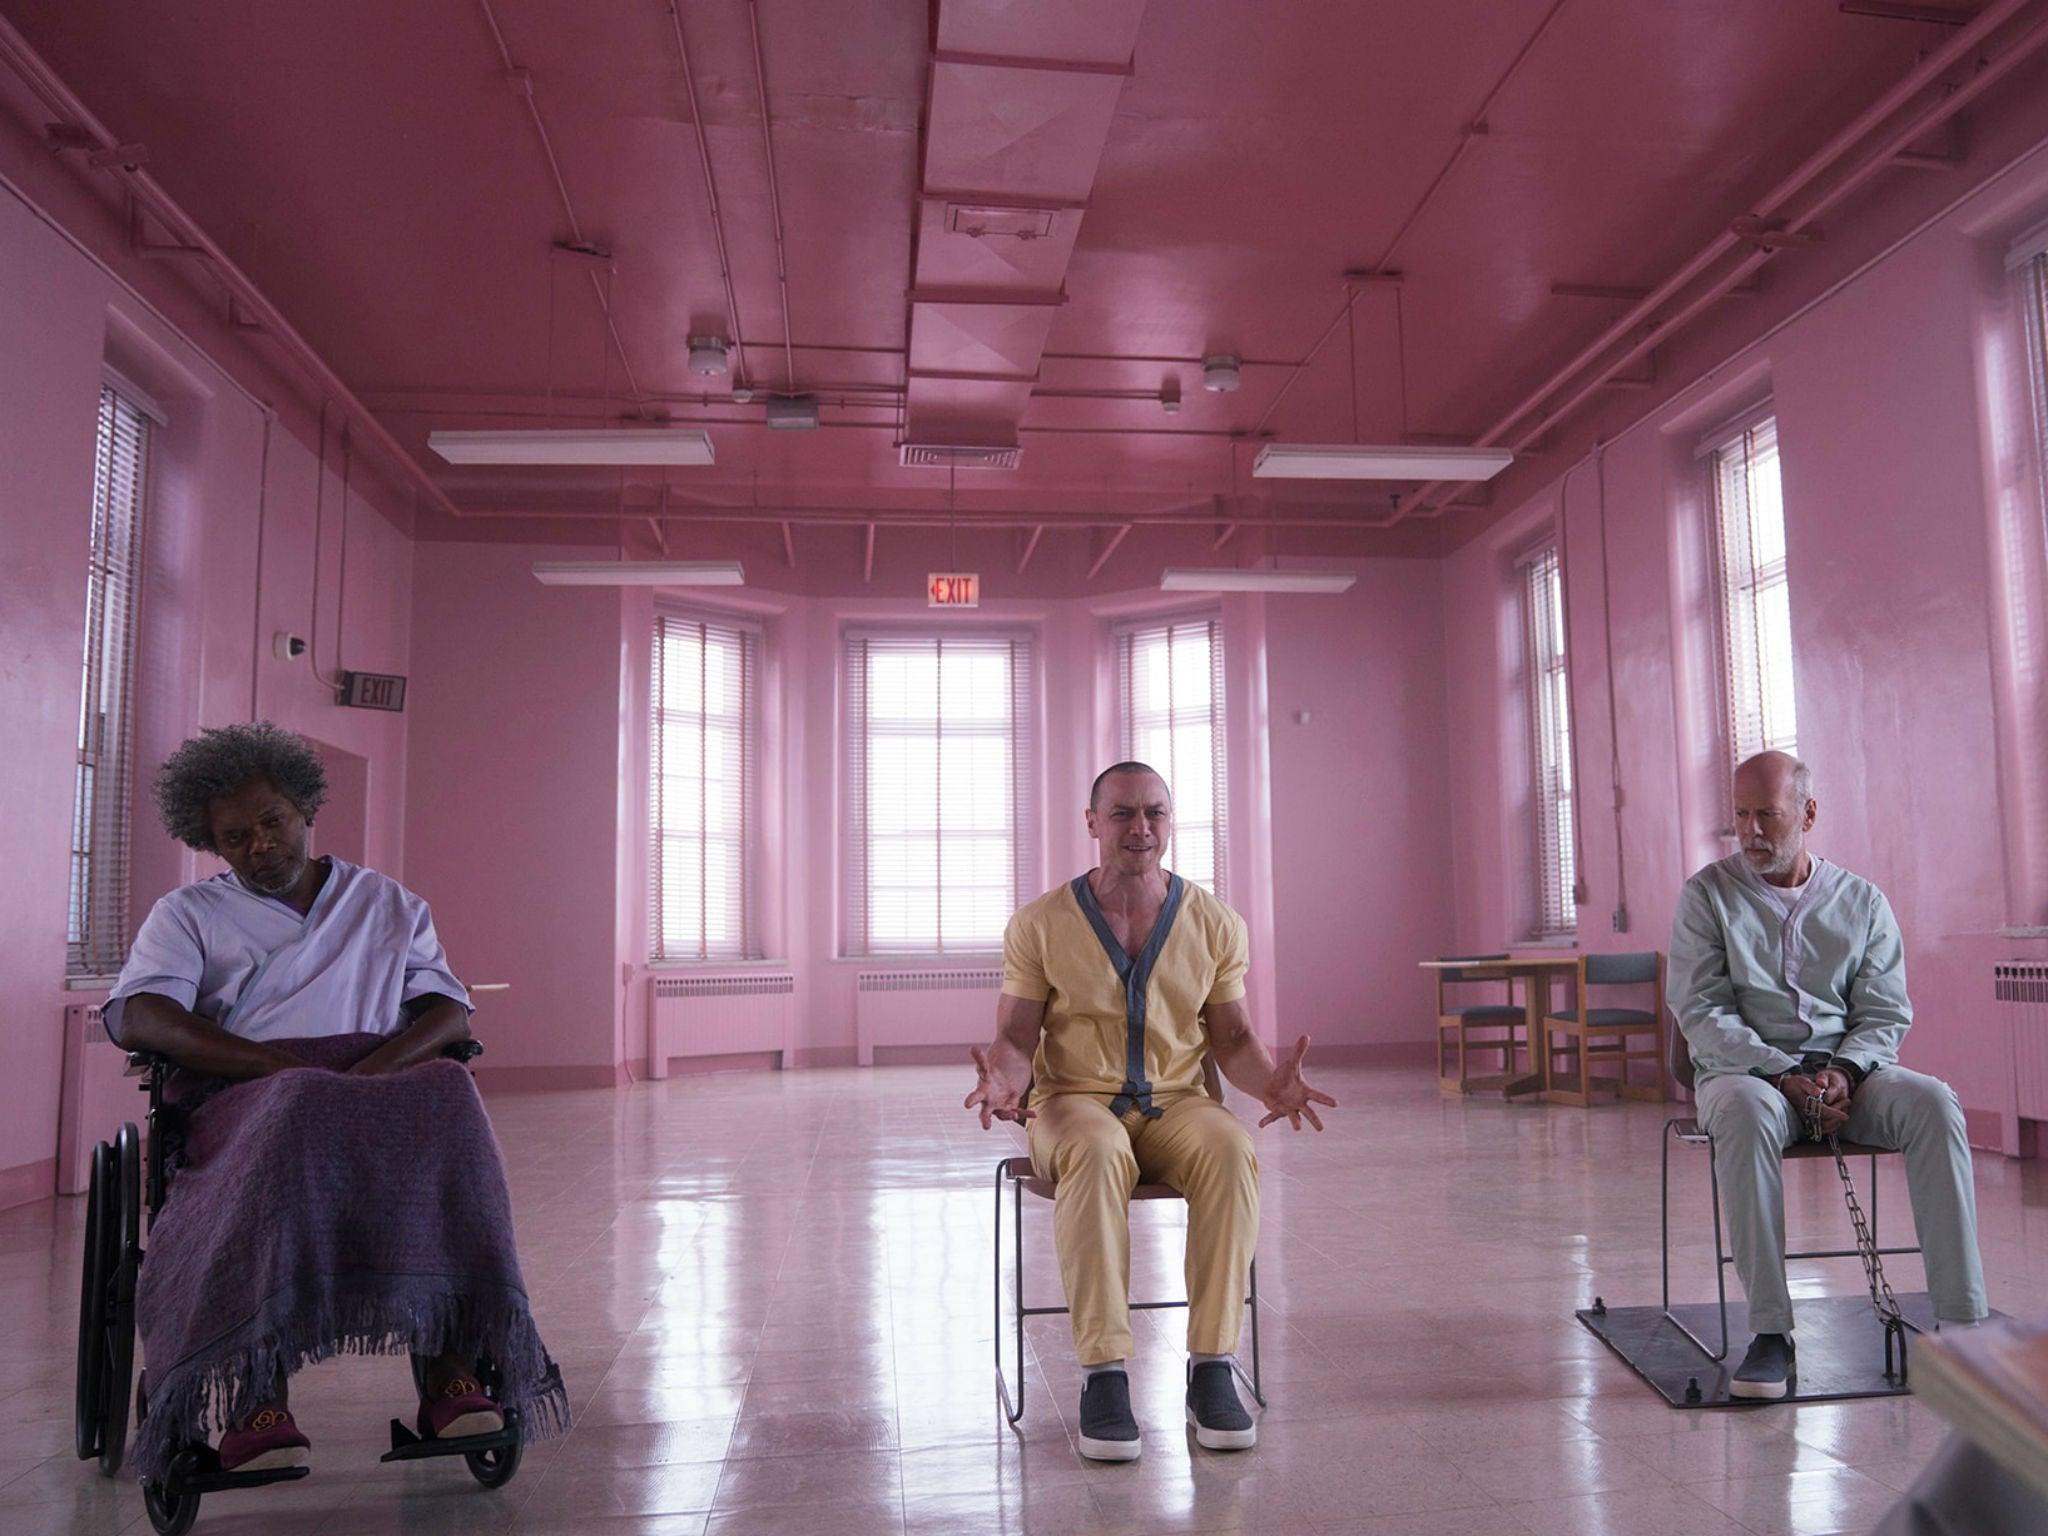 e69ffa328c8b Samuel L Jackson, James McAvoy and Bruce Willis in 'Glass' (Universal)